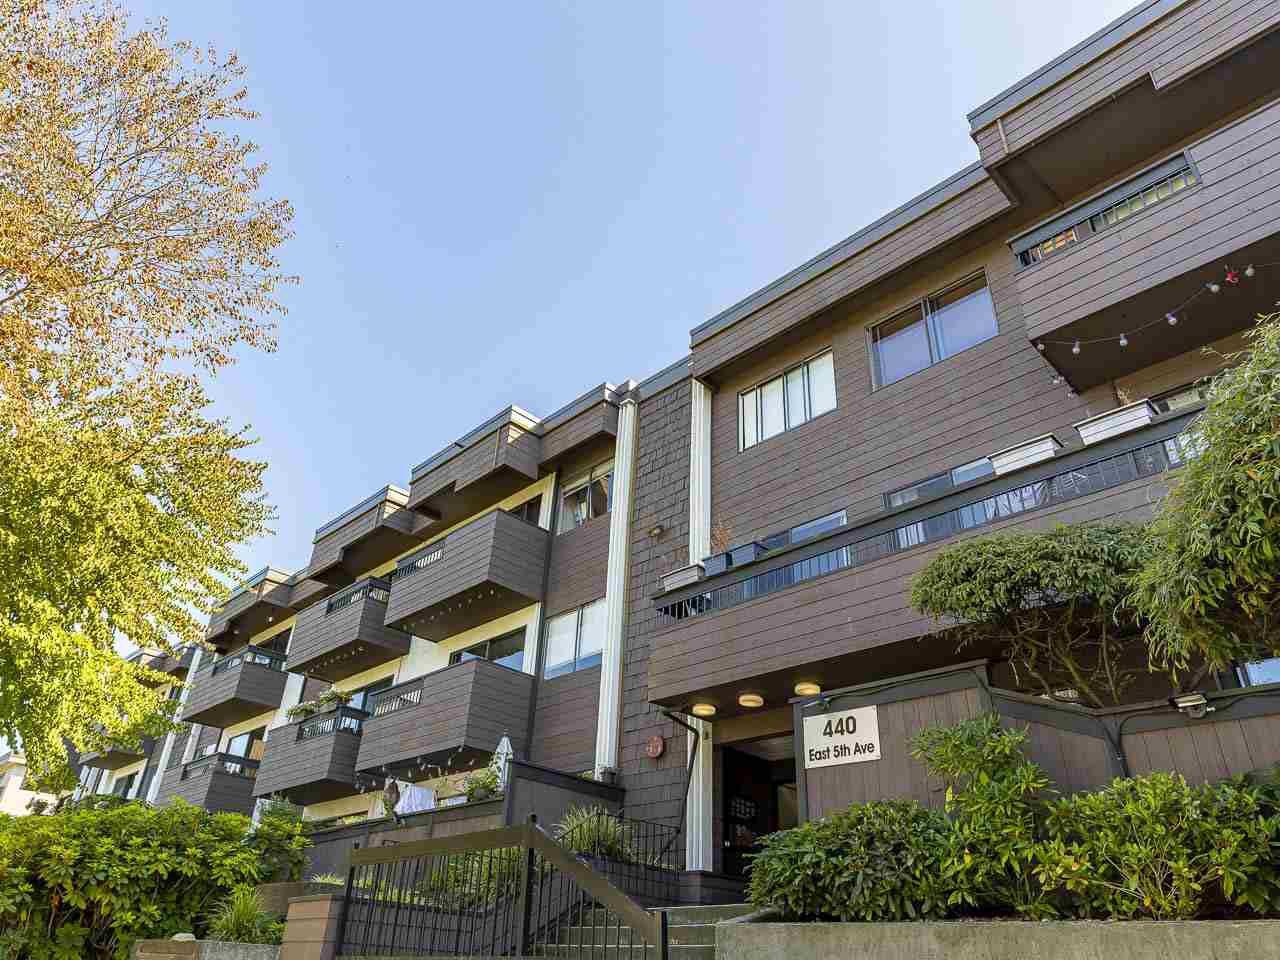 "Main Photo: 303 440 E 5TH Avenue in Vancouver: Mount Pleasant VE Condo for sale in ""Landmark Manor"" (Vancouver East)  : MLS®# R2400226"